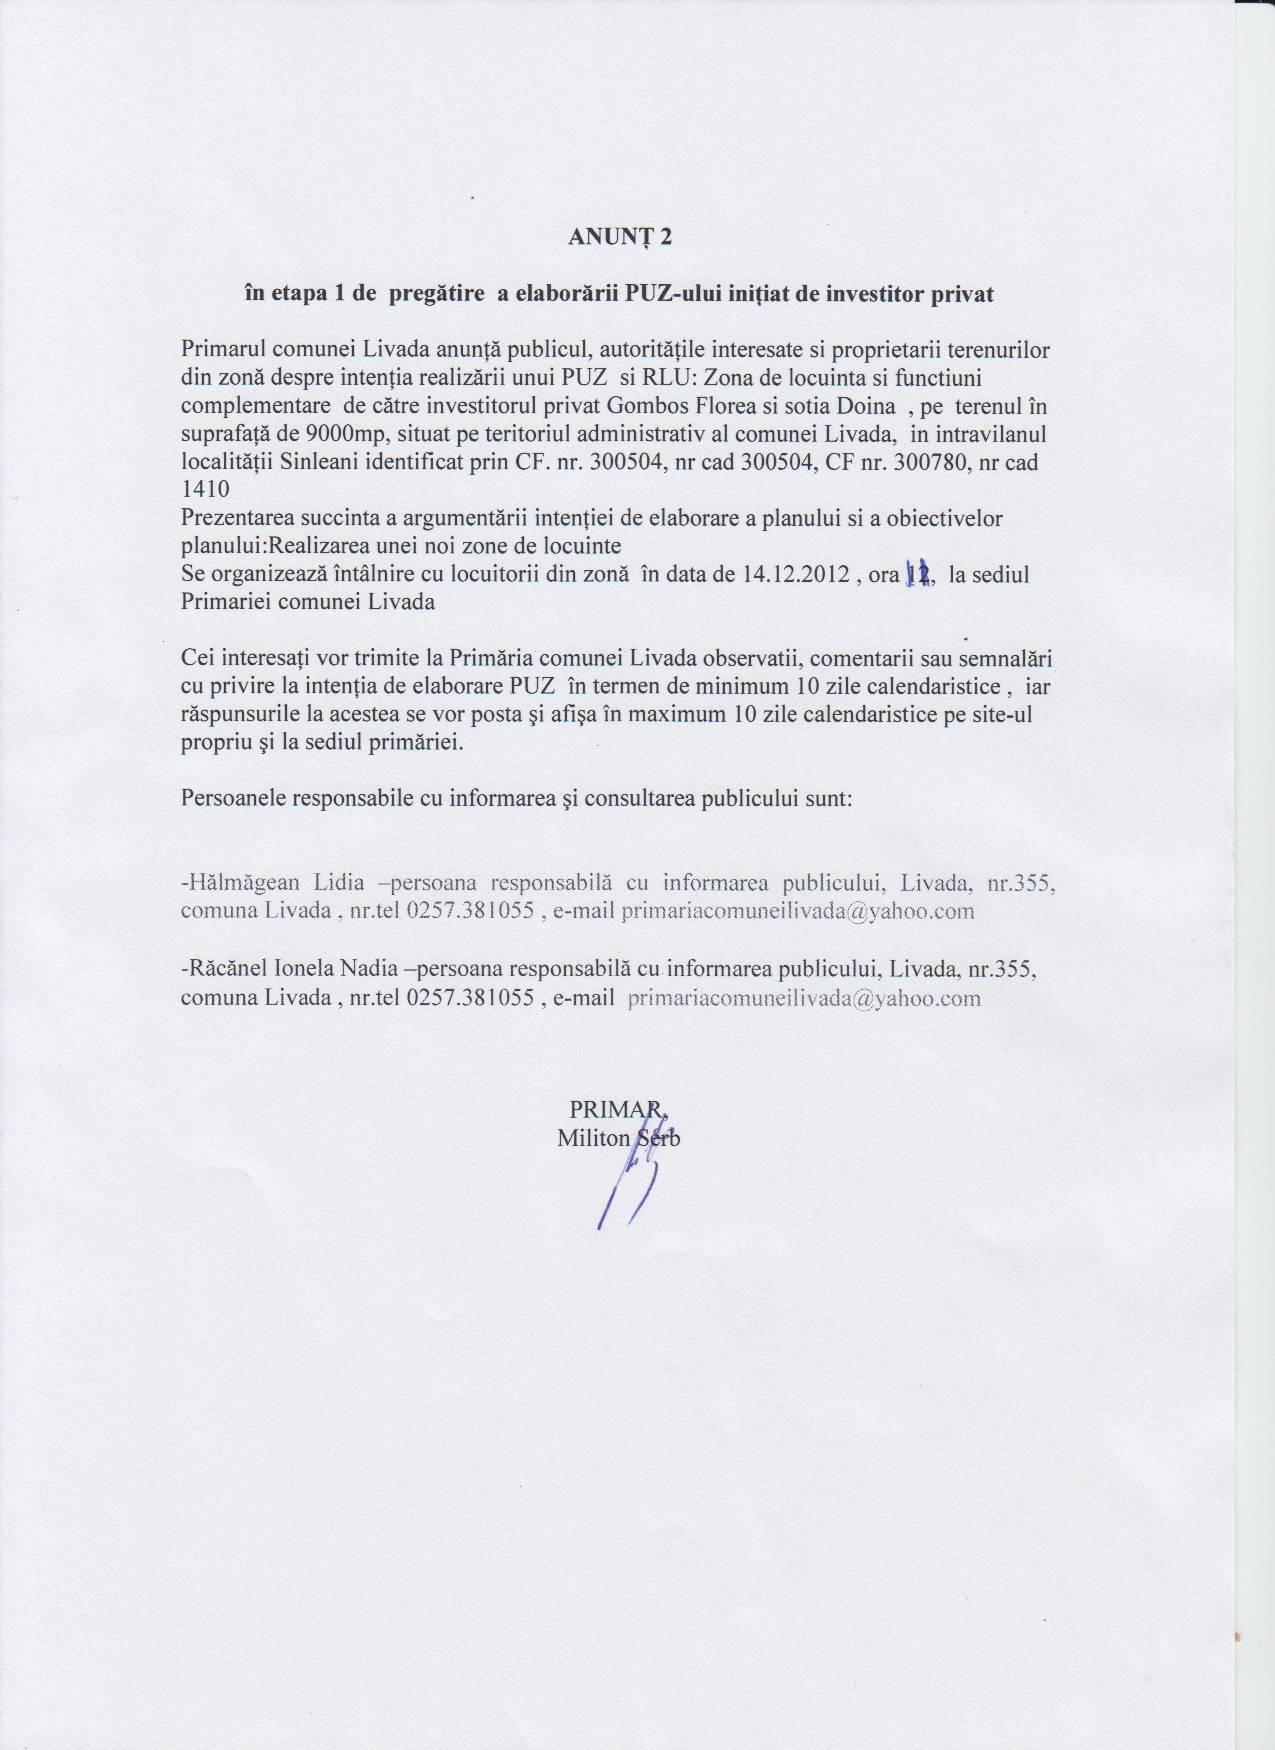 20121210_anunt